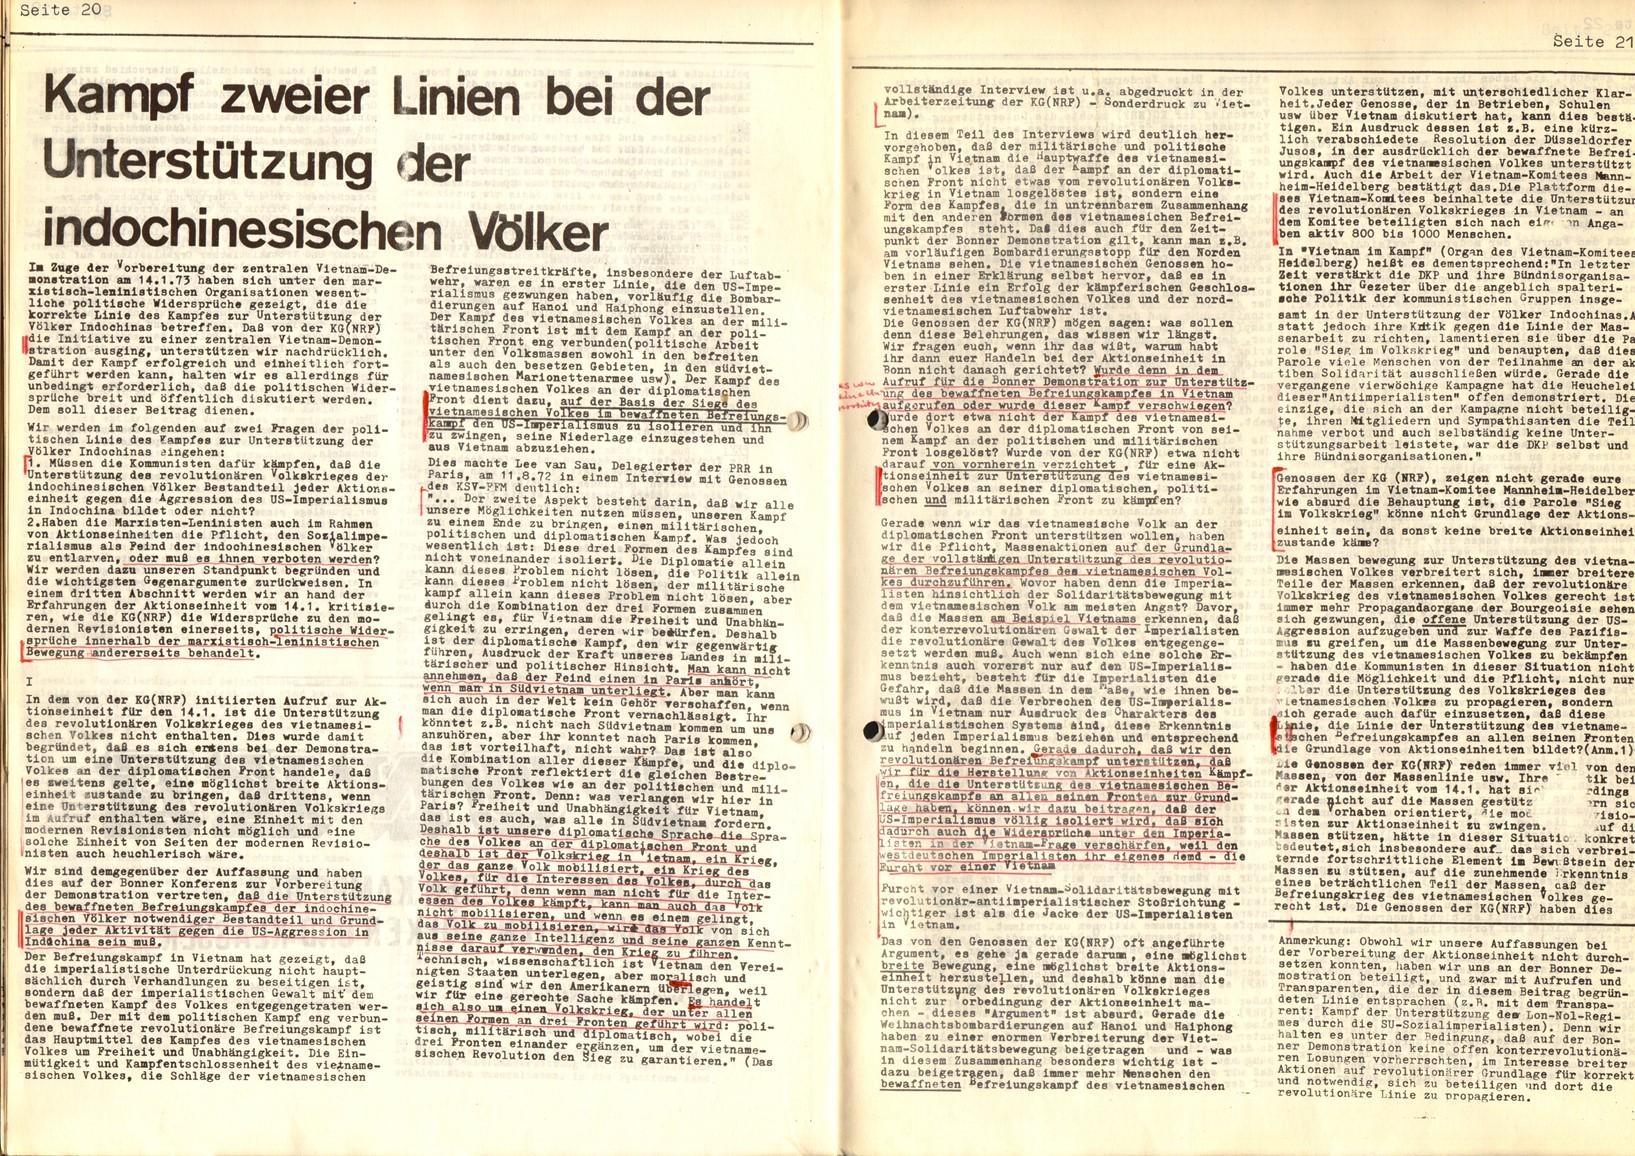 Aachen_Beitraege_revolutionaere_Politik_1973_01_11